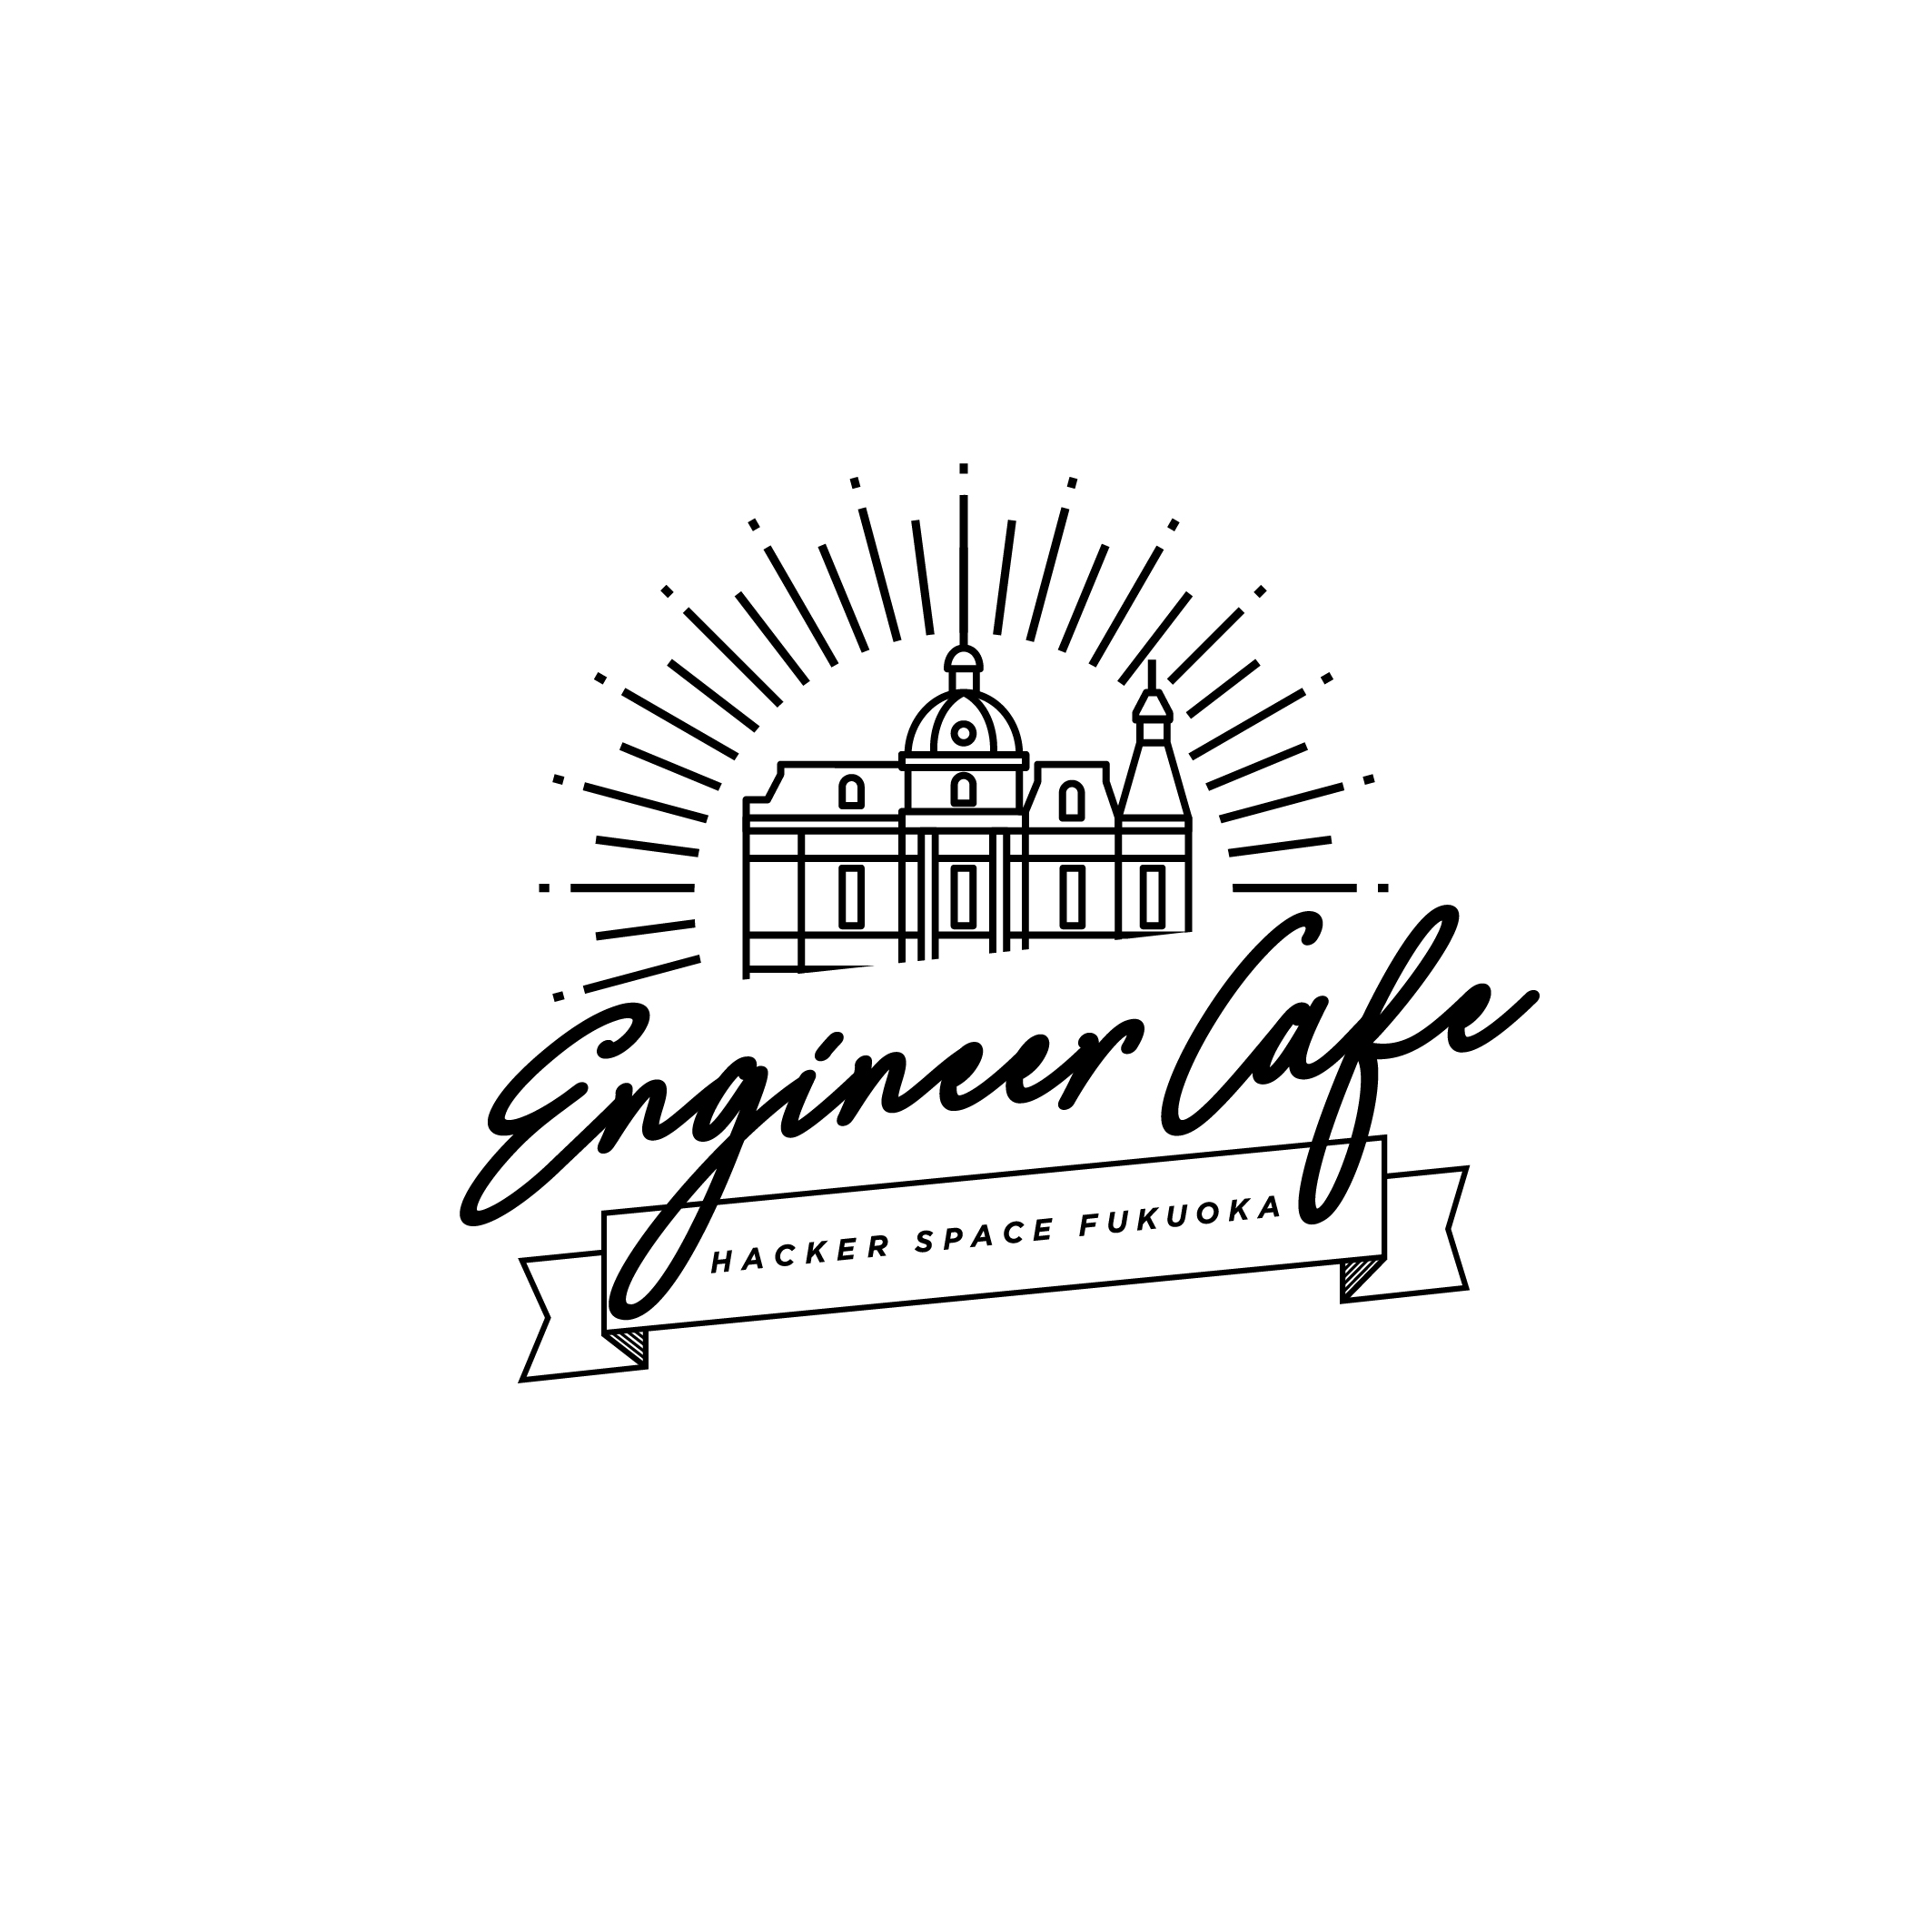 Engineer Cafe